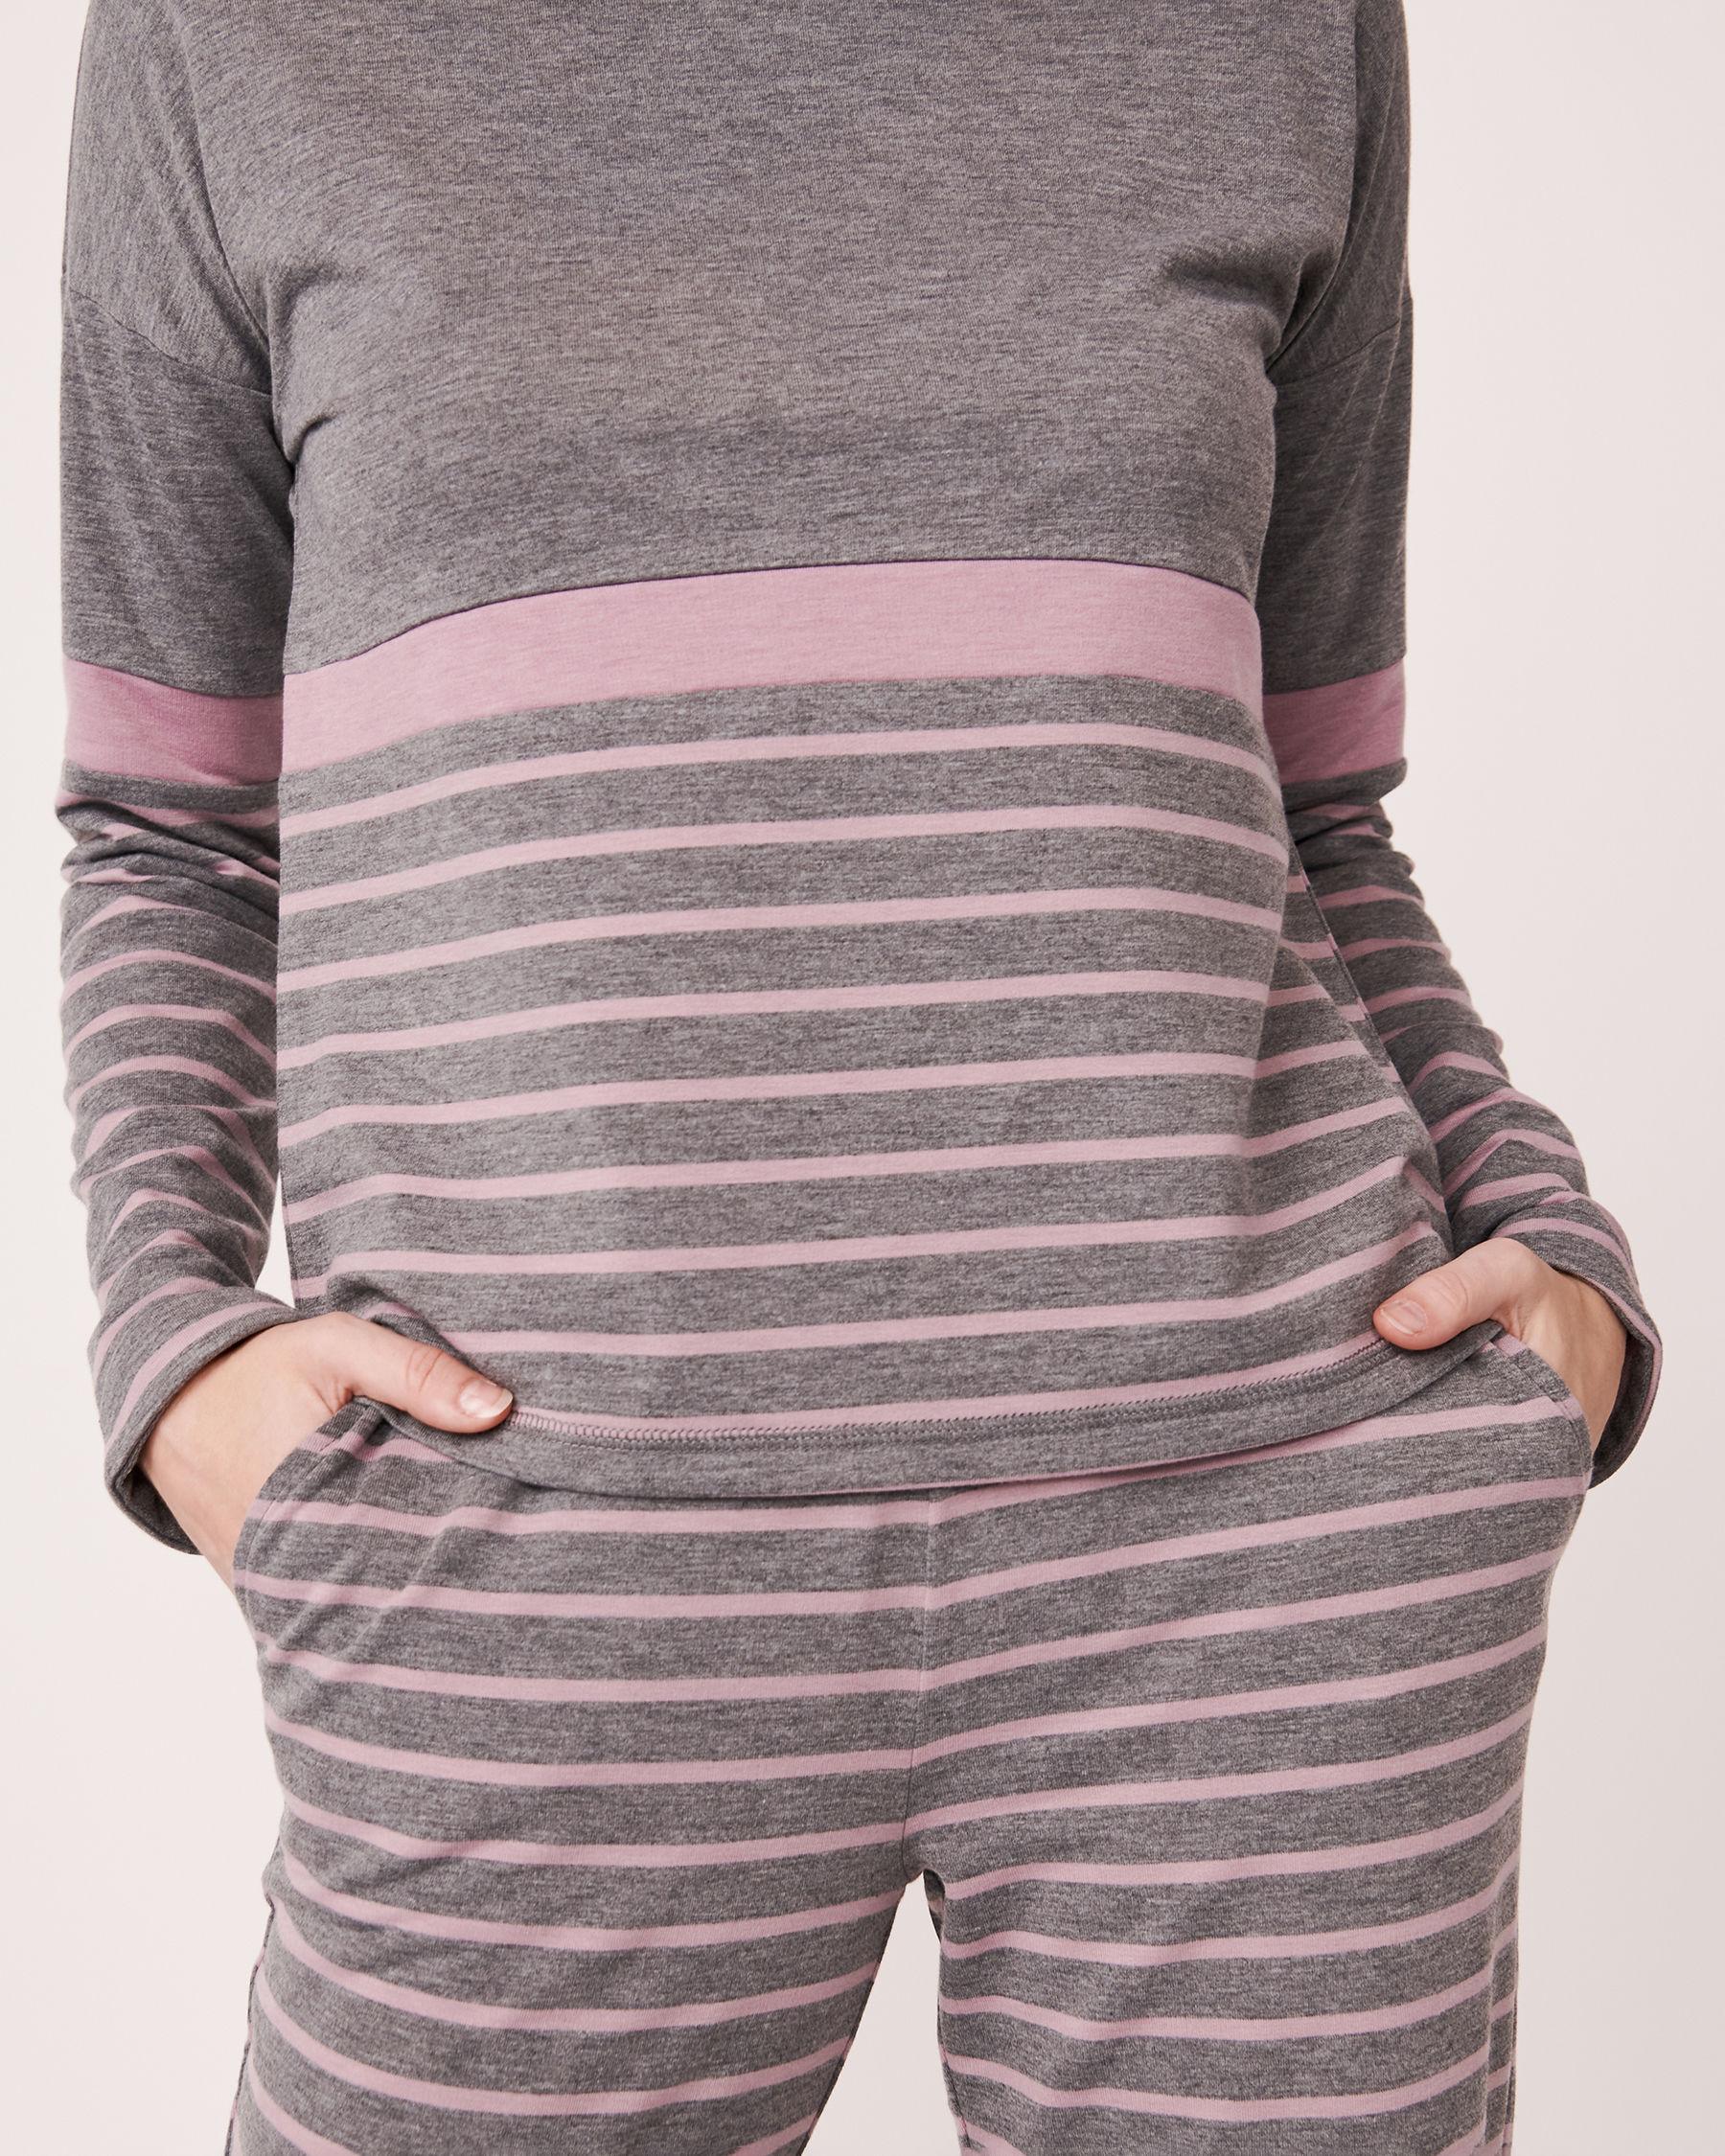 LA VIE EN ROSE Long Sleeve Striped Shirt Grey and pink mix 768-373-0-11 - View3